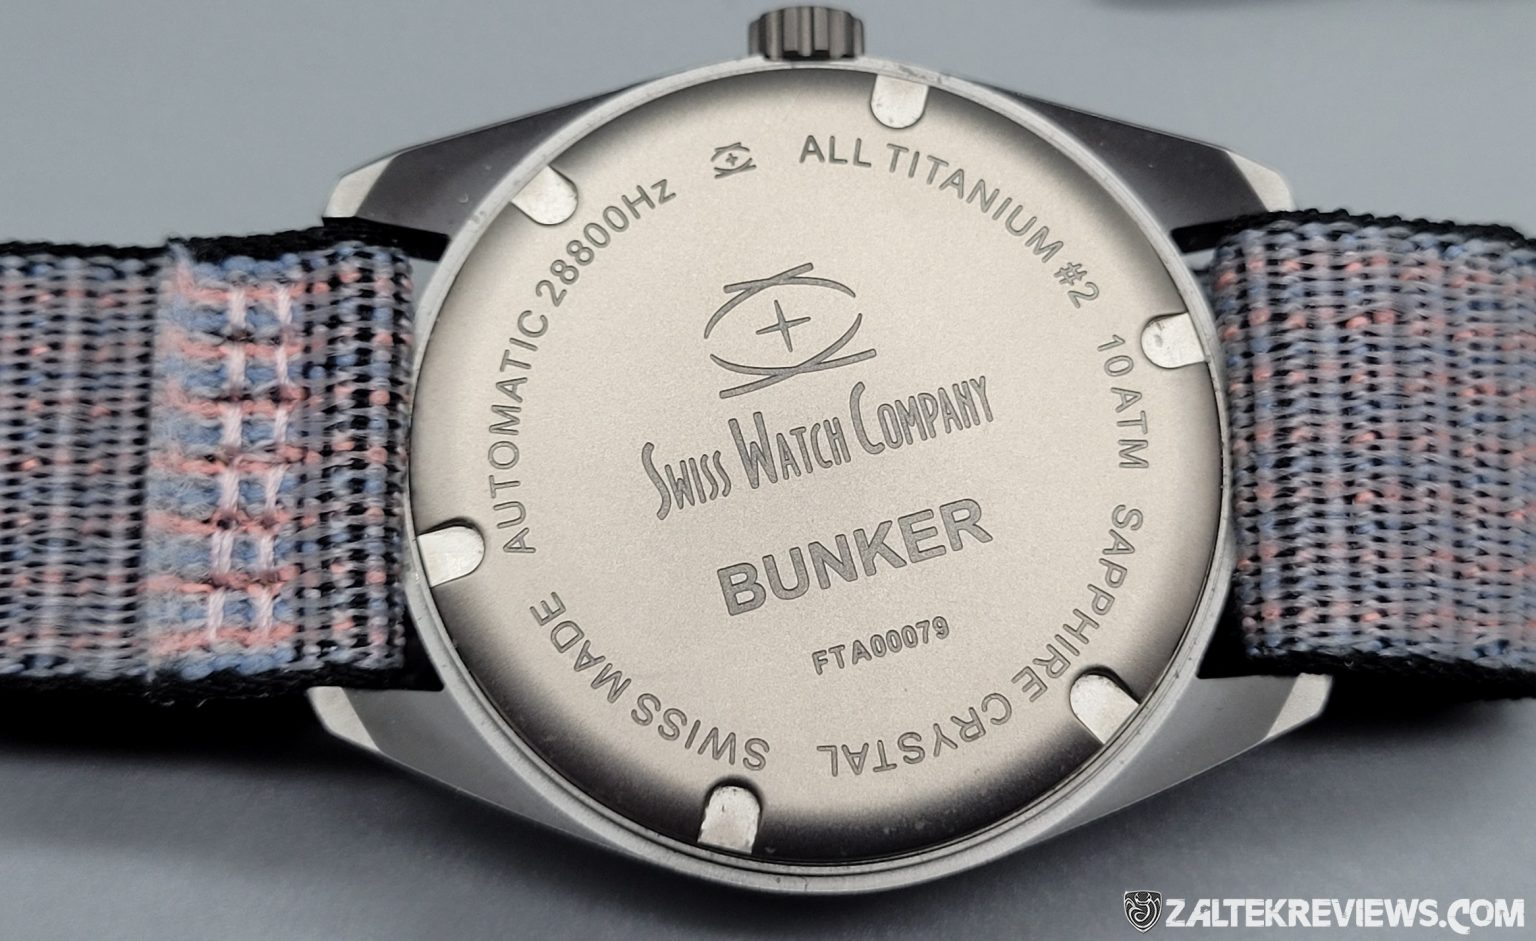 Swiss Watch Company (SWC) Bunker, Titanium Field Watch Review